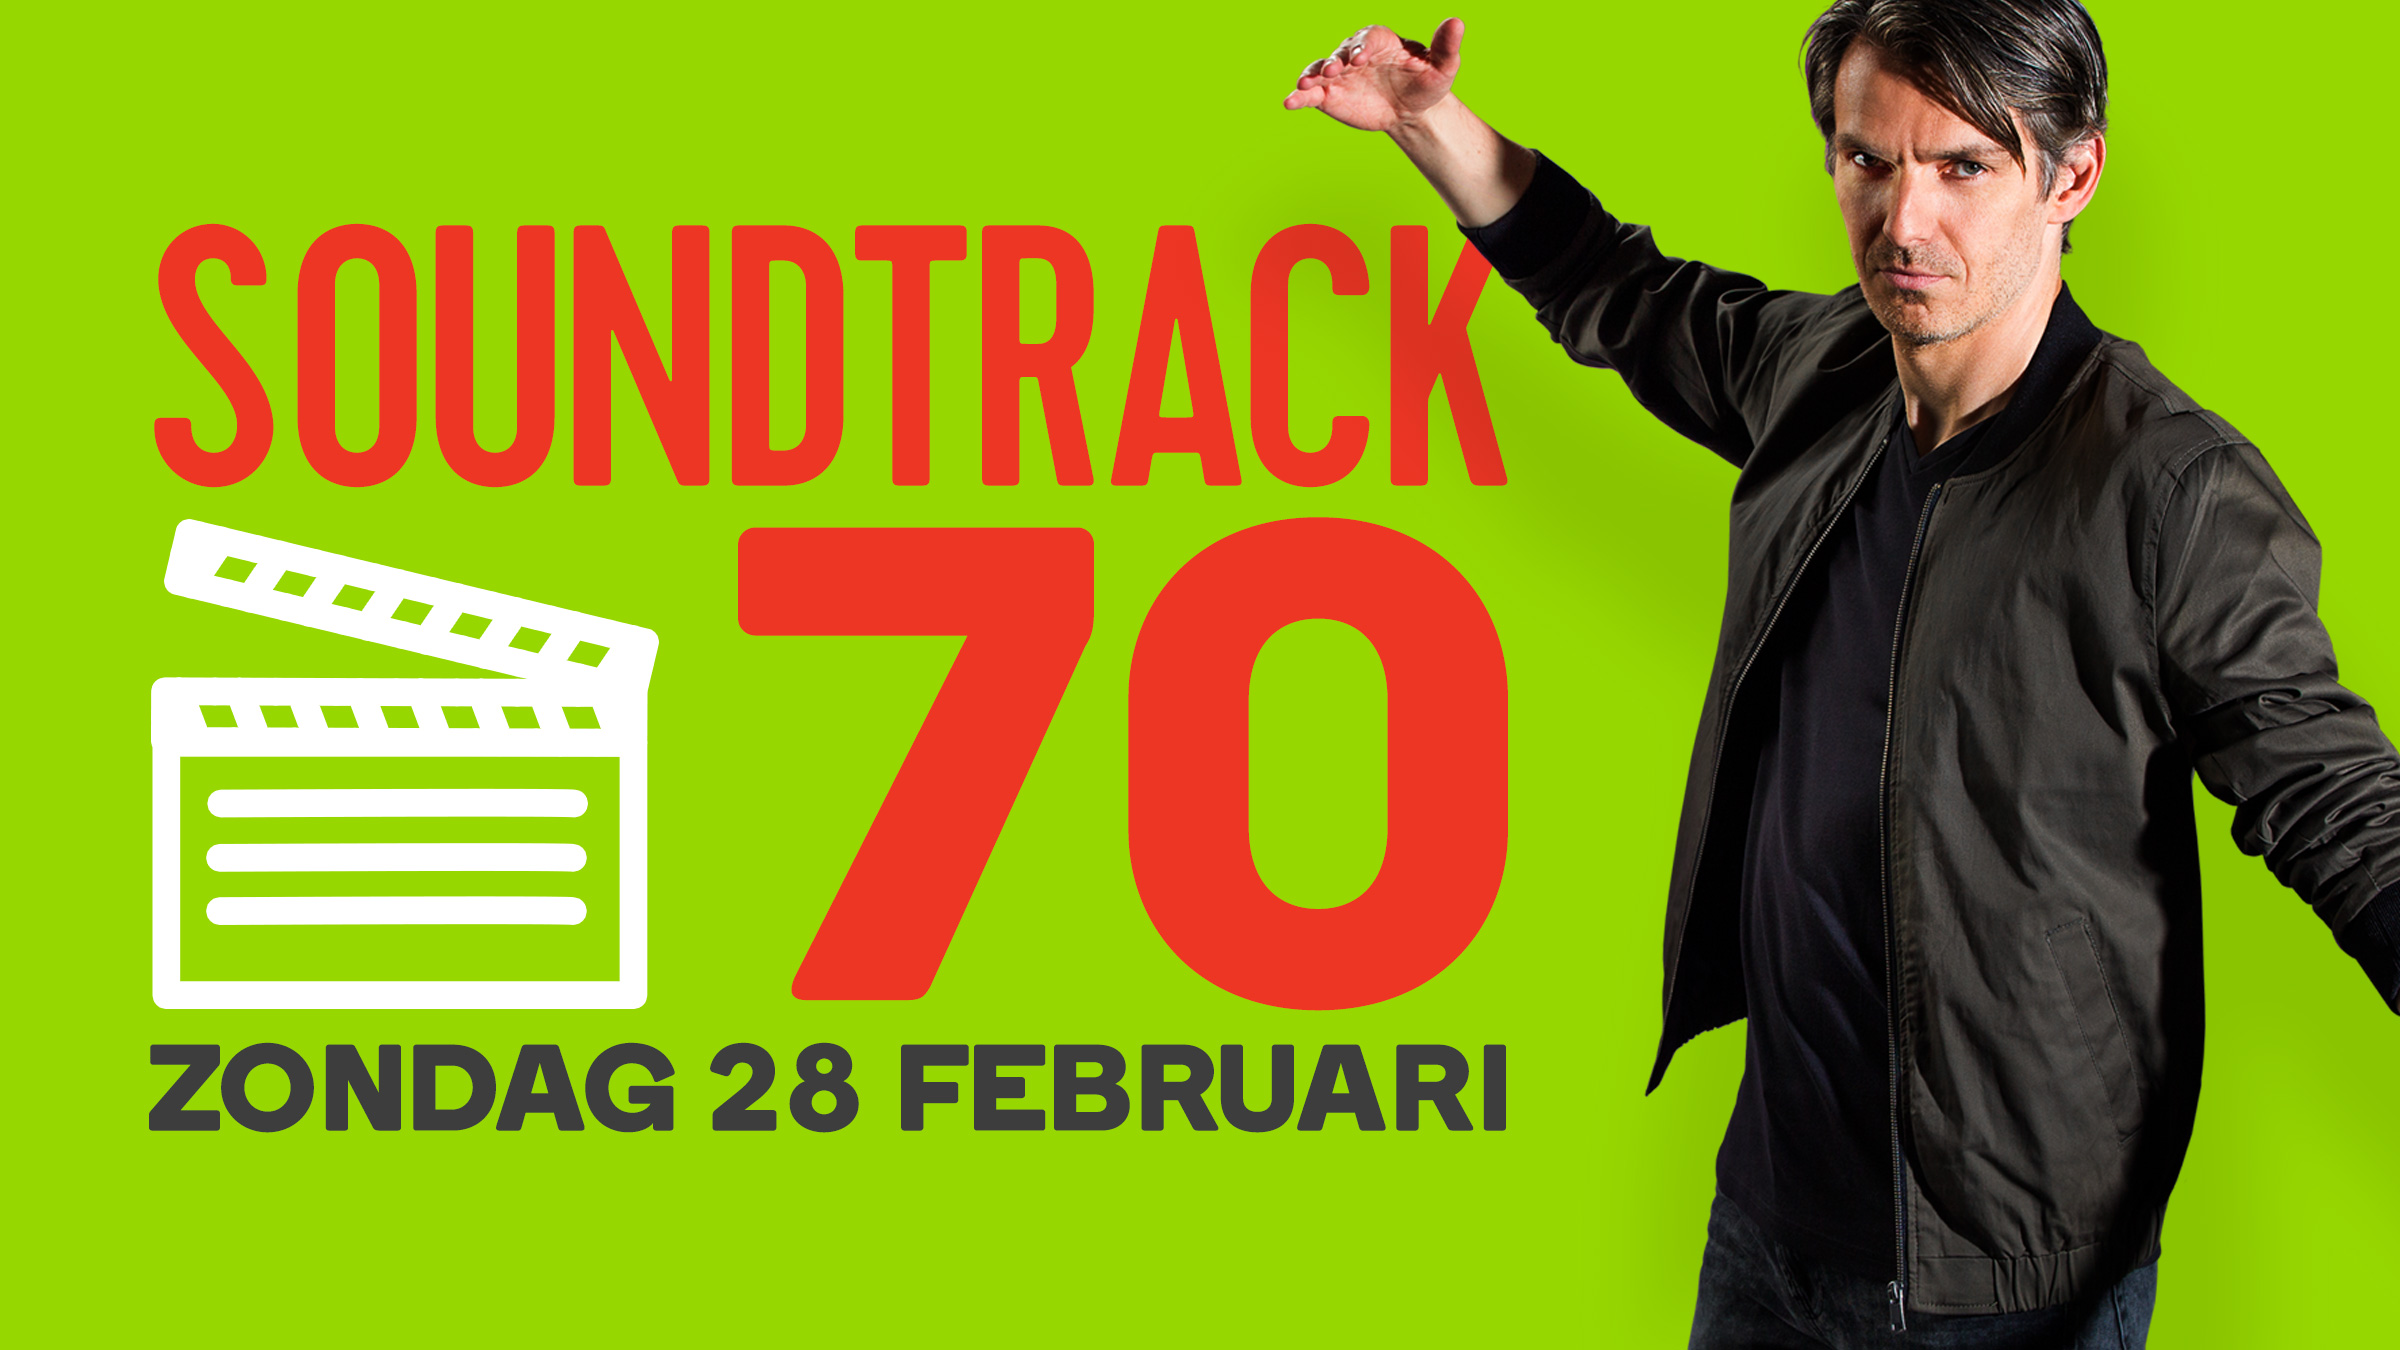 16x9 soundtrack70 prog